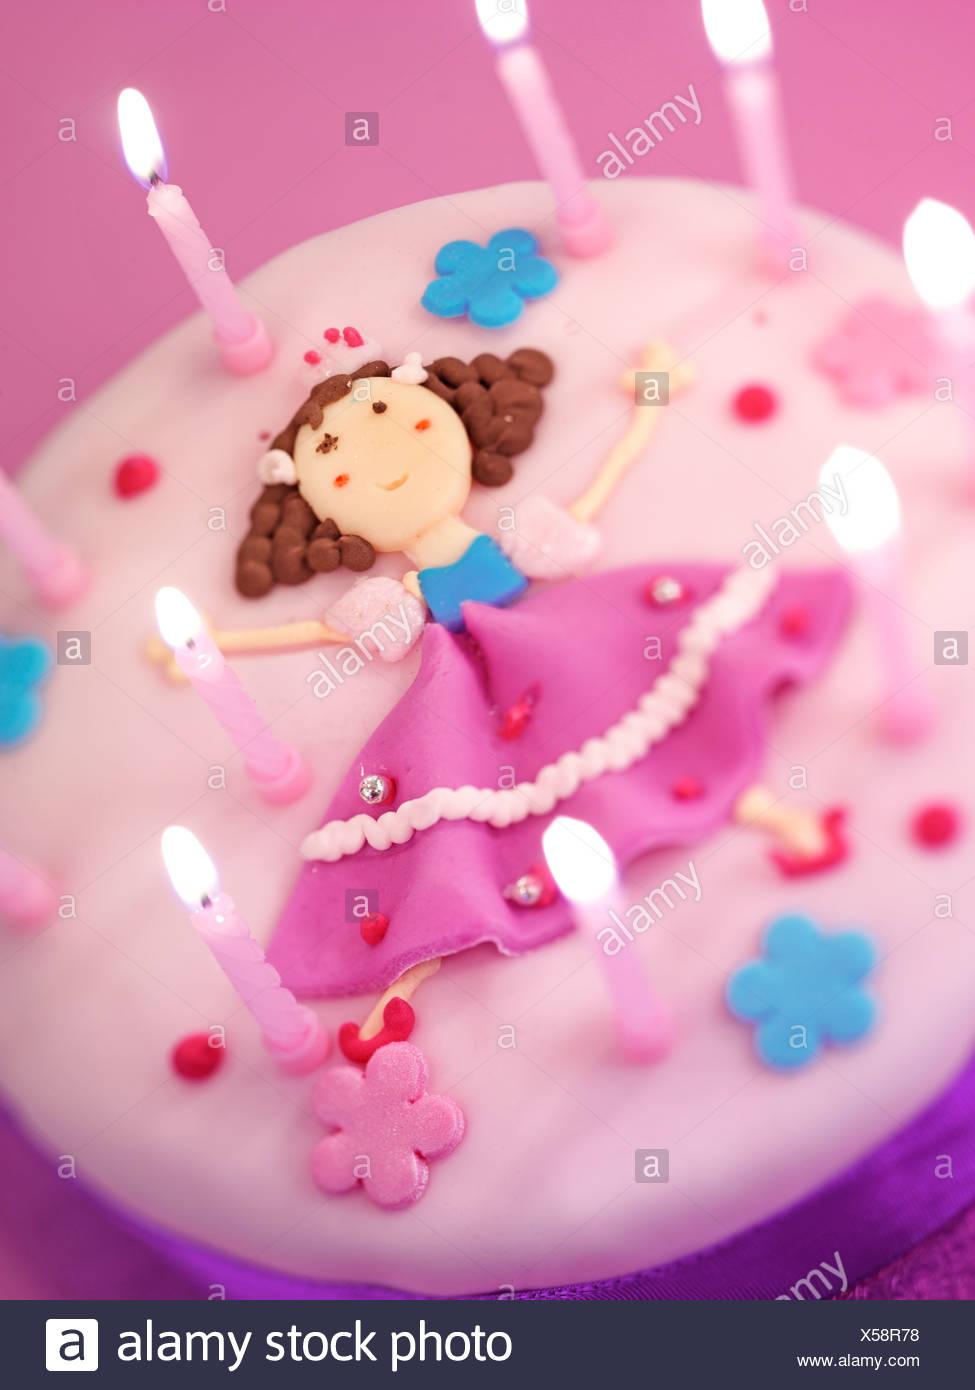 Superb Girls Birthday Cake Stock Photo 278633020 Alamy Personalised Birthday Cards Paralily Jamesorg